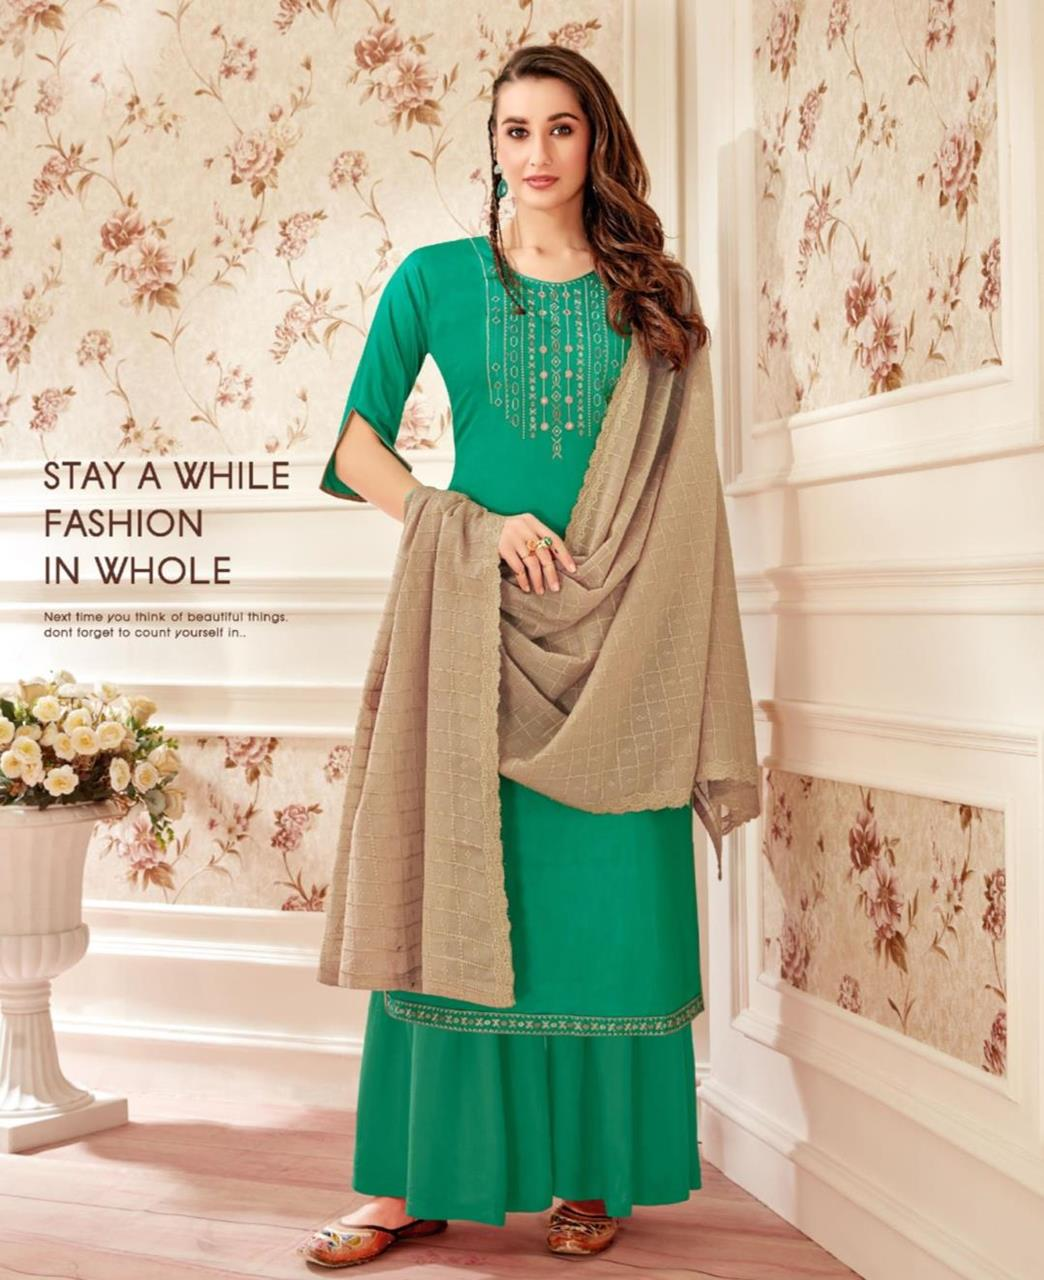 Embroidered Cotton Straight cut Salwar Kameez in Green